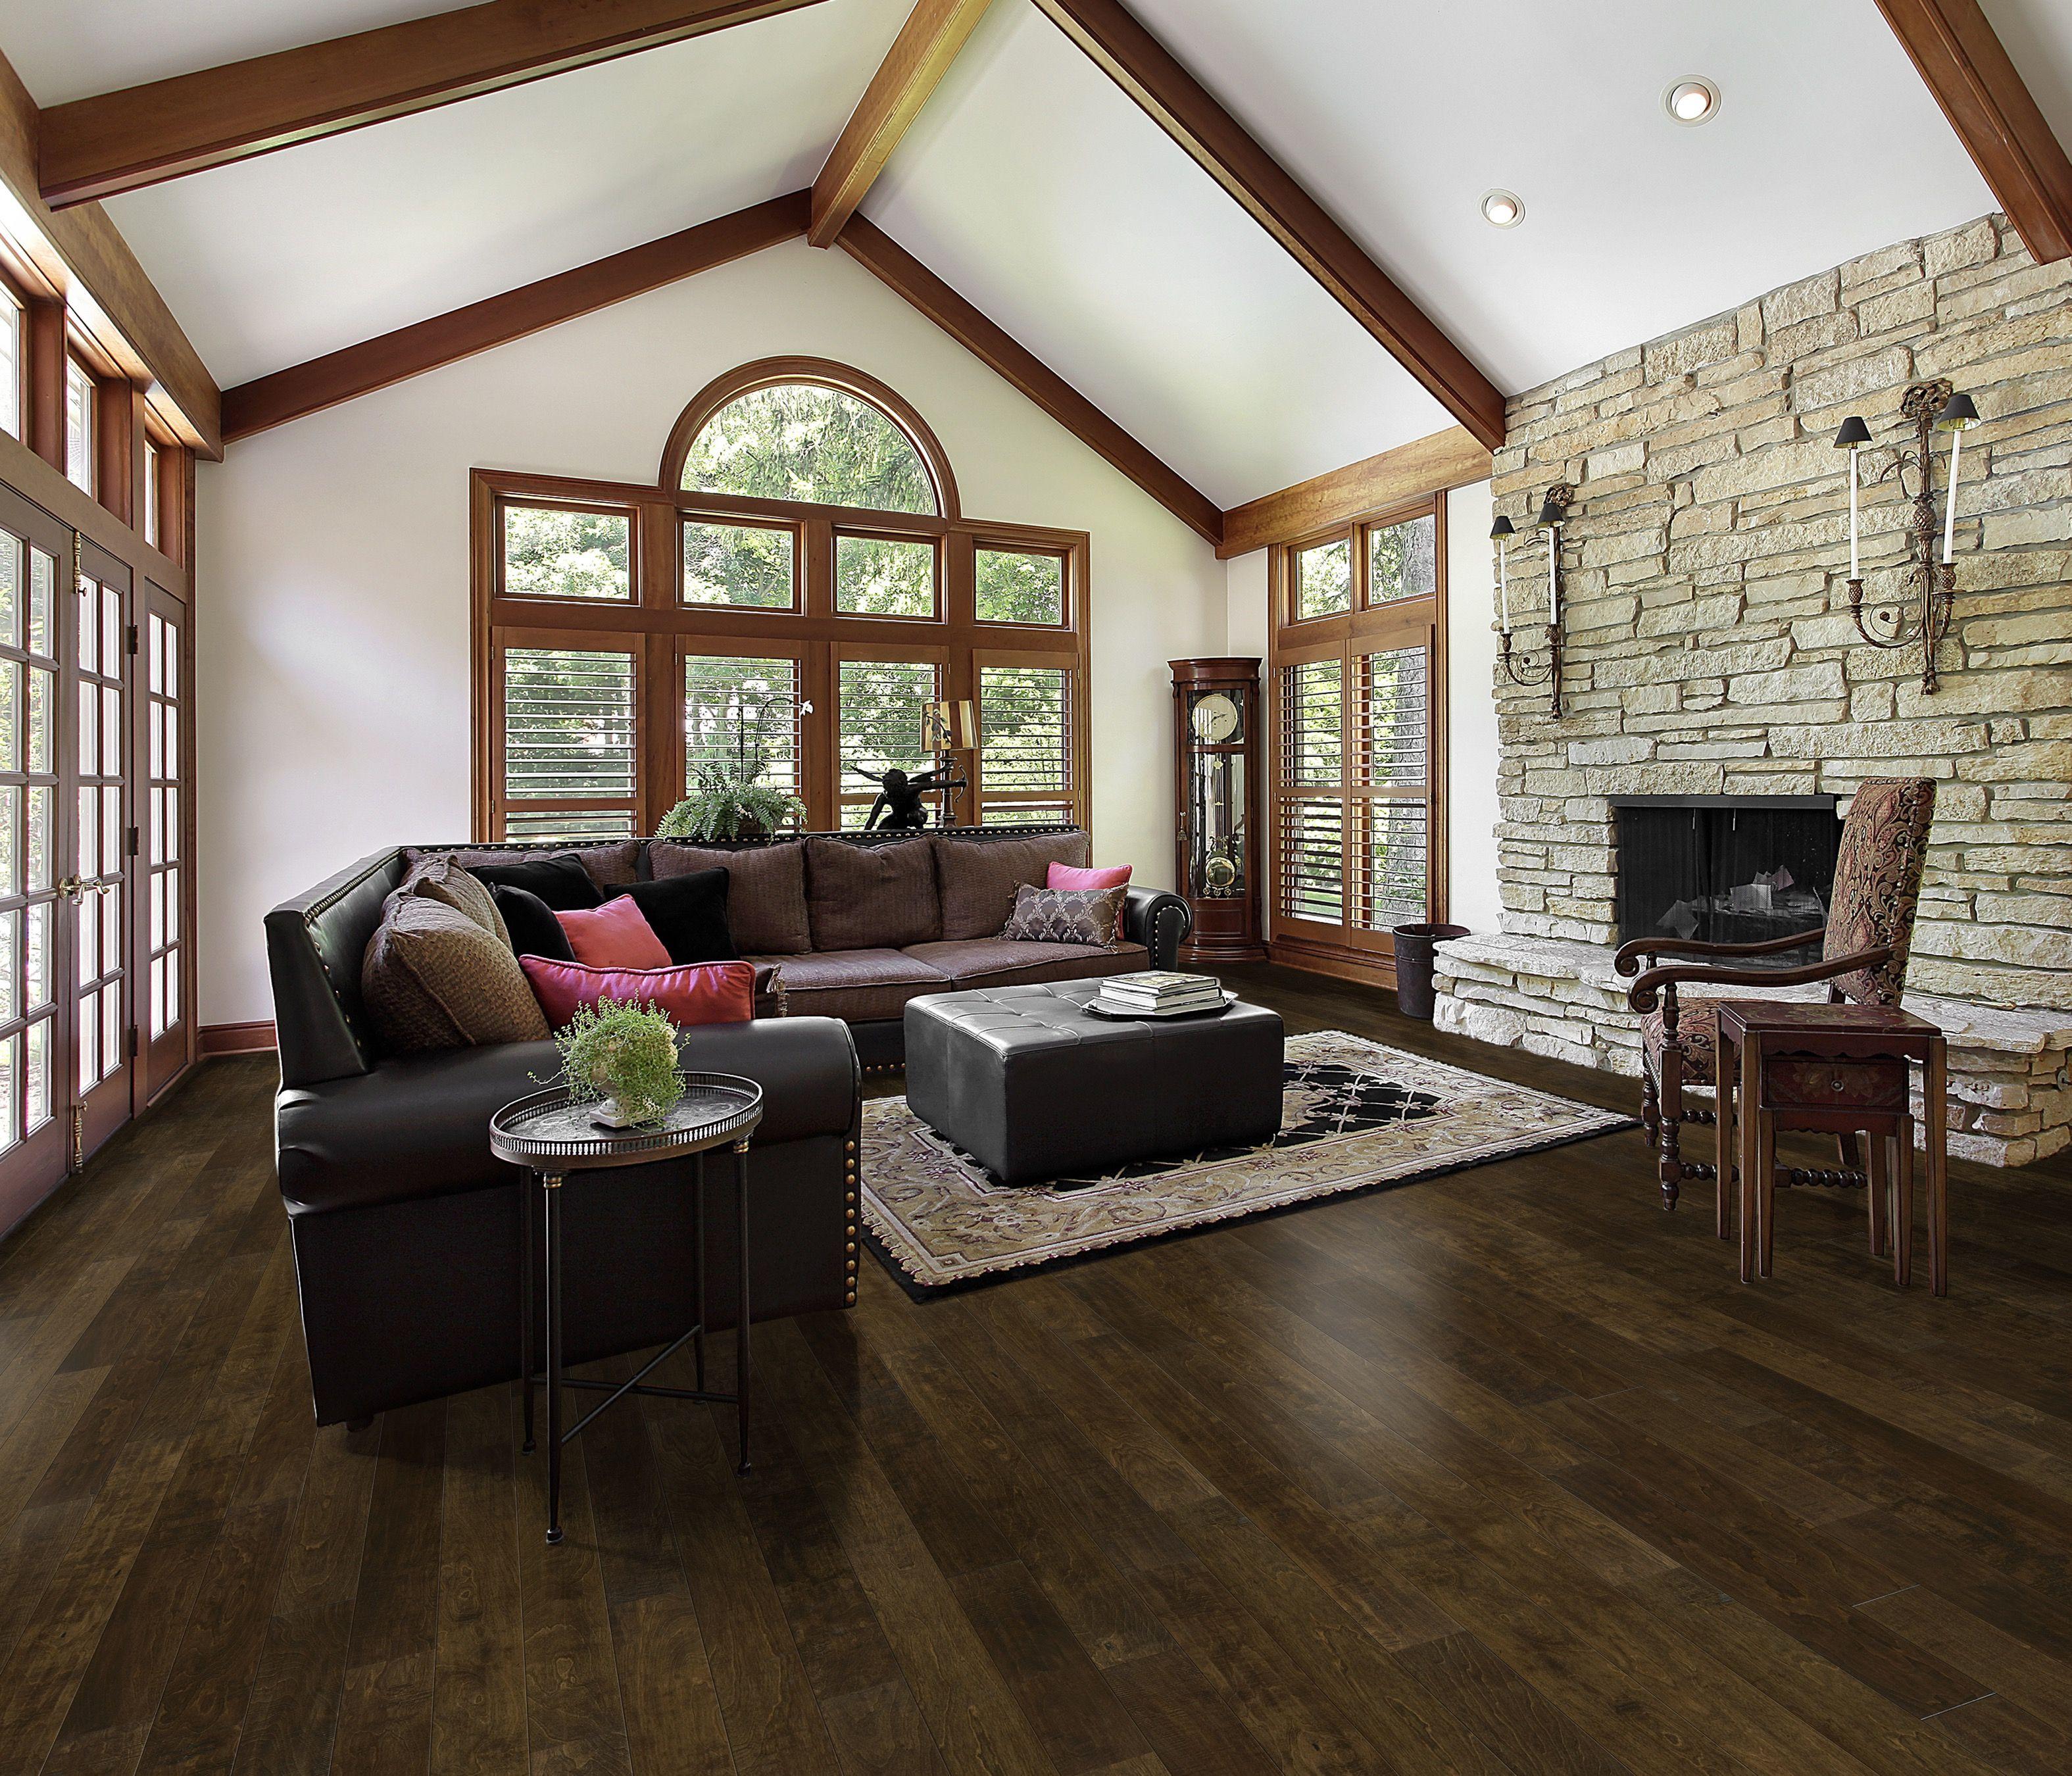 hardwood floor refinishing kansas city mo of svb wood floors kansas city wikizie co for ponderosa birch navajo pre finished wood floors